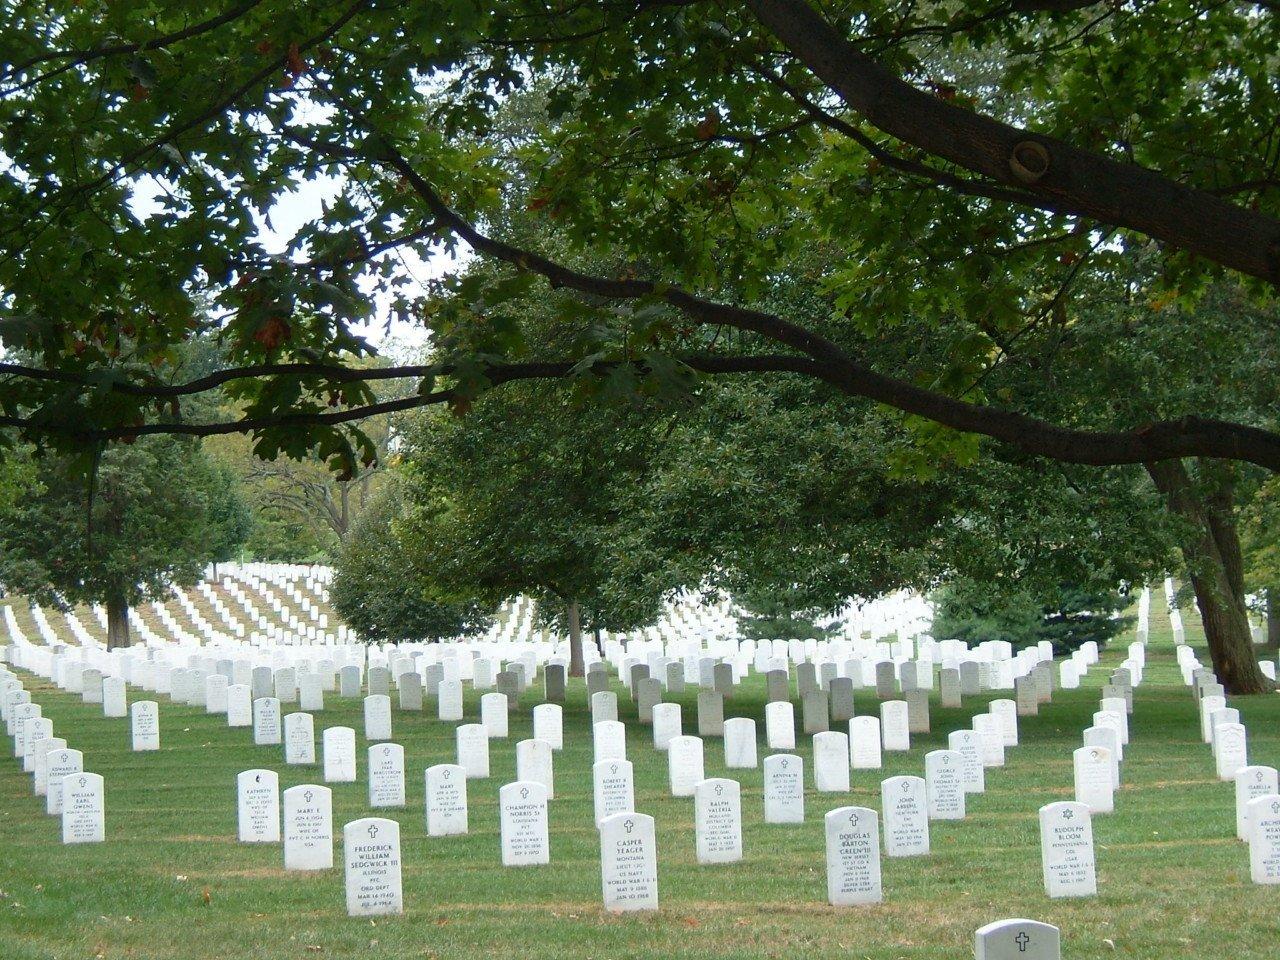 Cimitero arlington, Virginia, America, Washington dc, 24 ore a washington DC